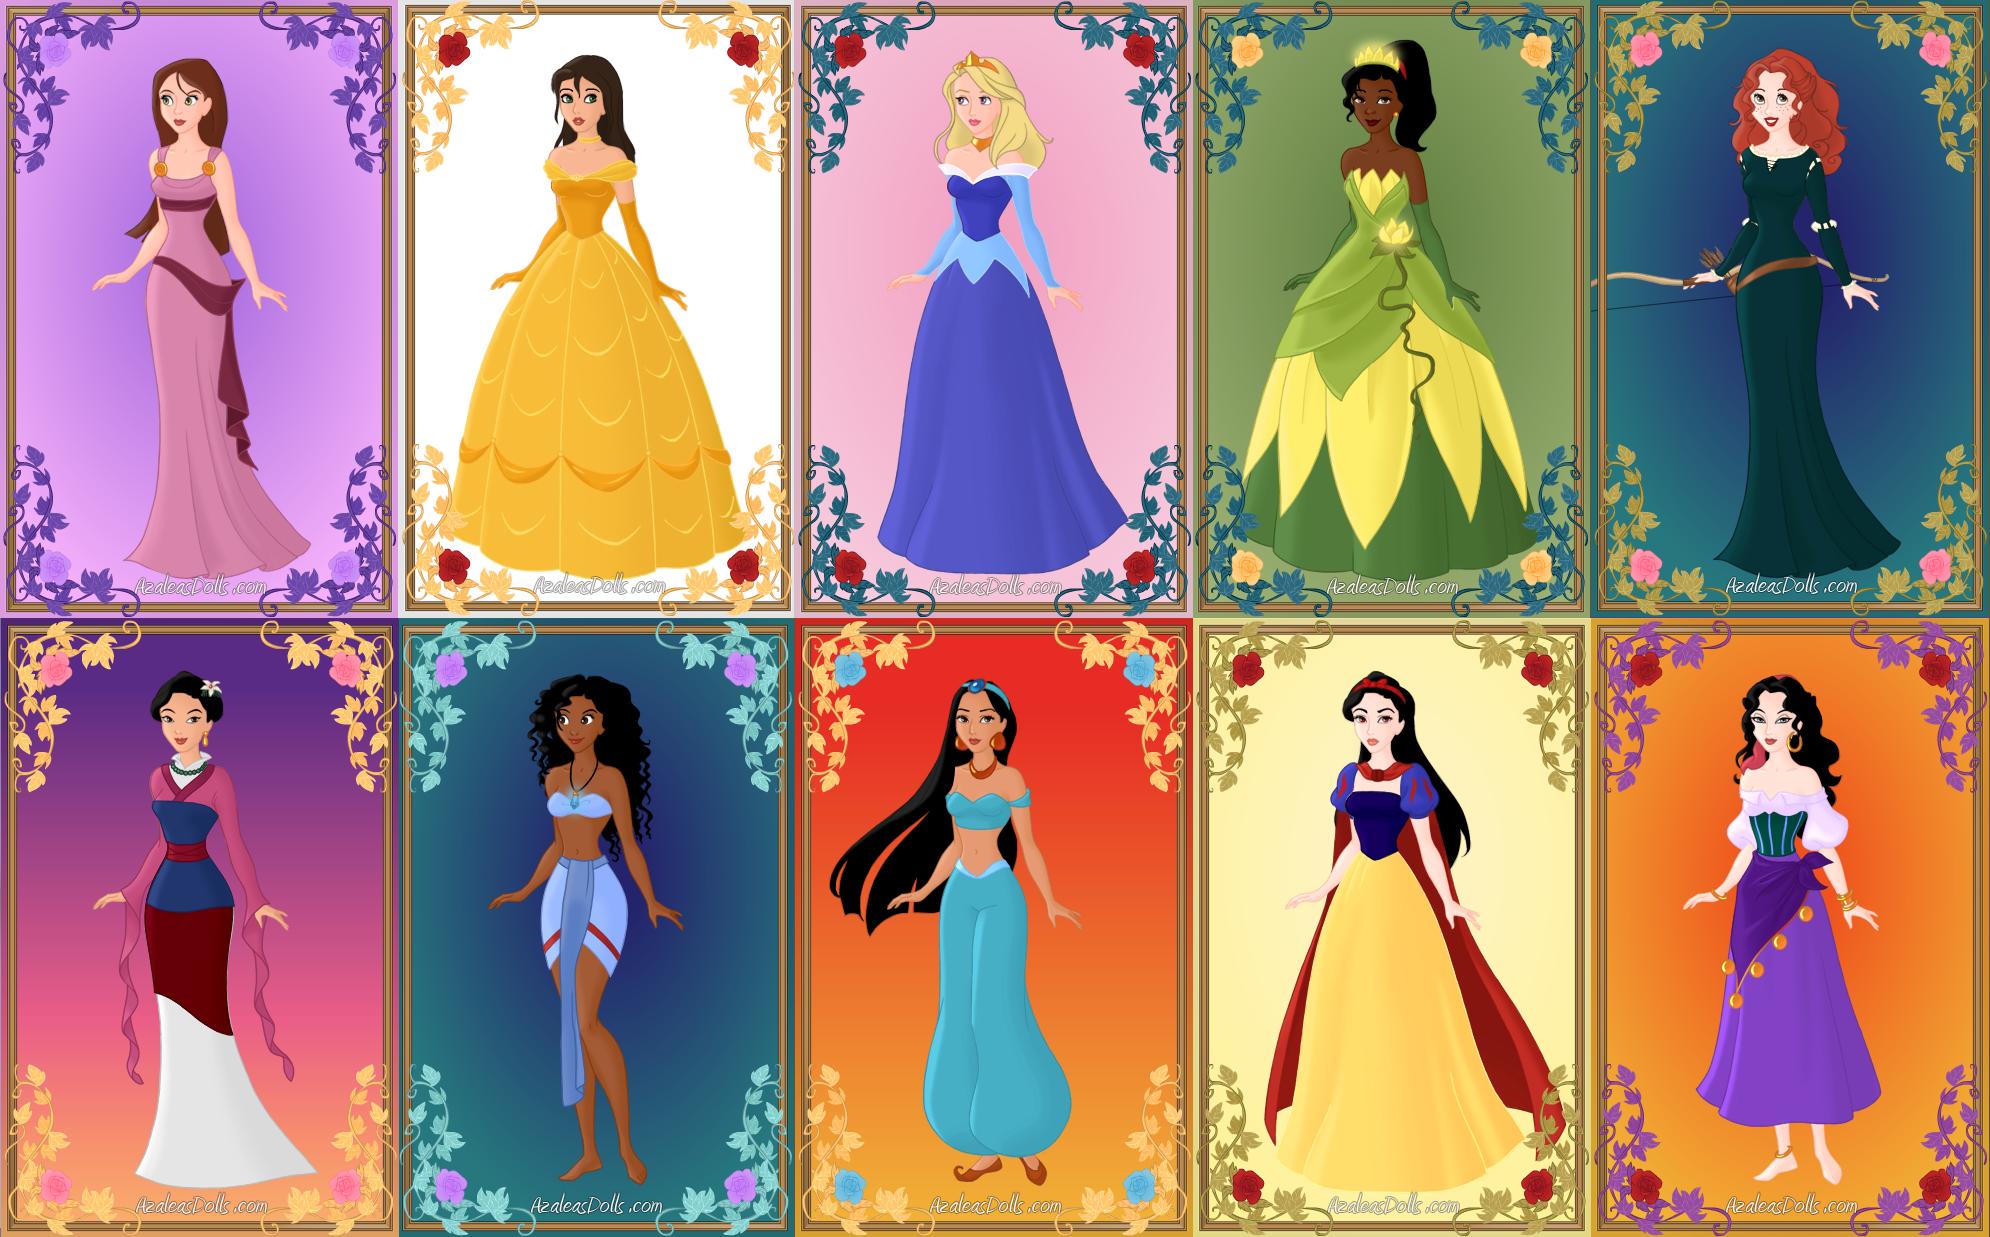 Ocs Disney Cosplay By Katiebat On Deviantart